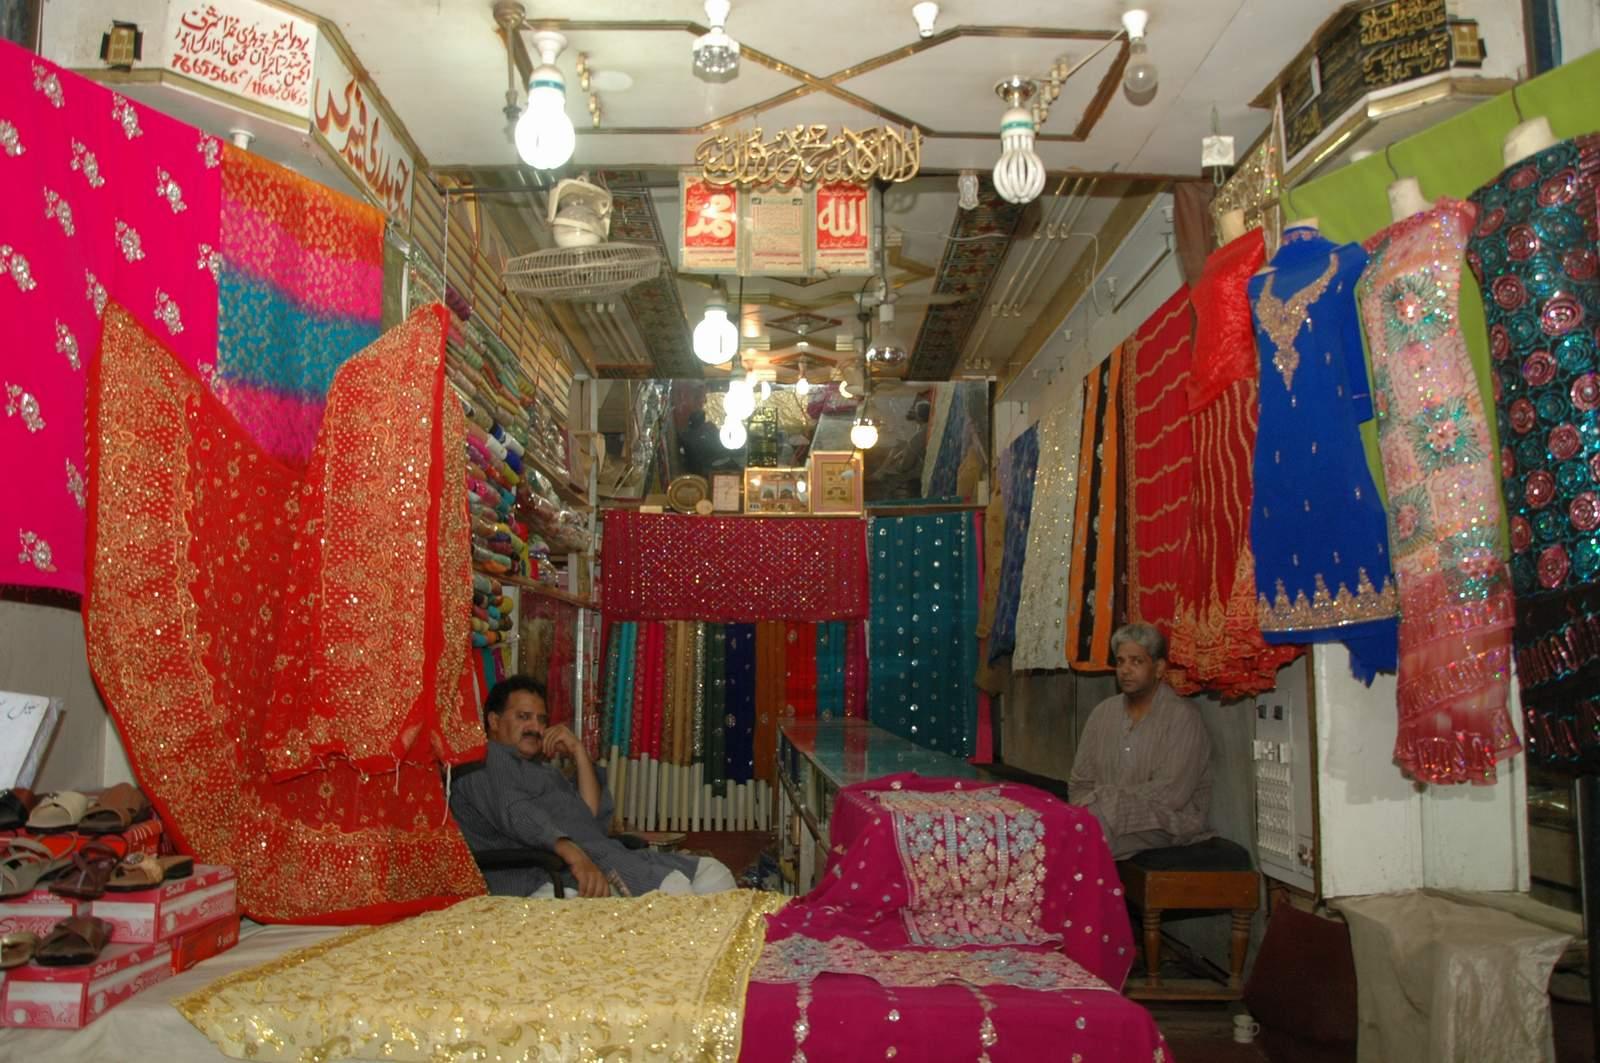 Shiraz hassan colors of gumti bazaar for Bano bazar anarkali lahore